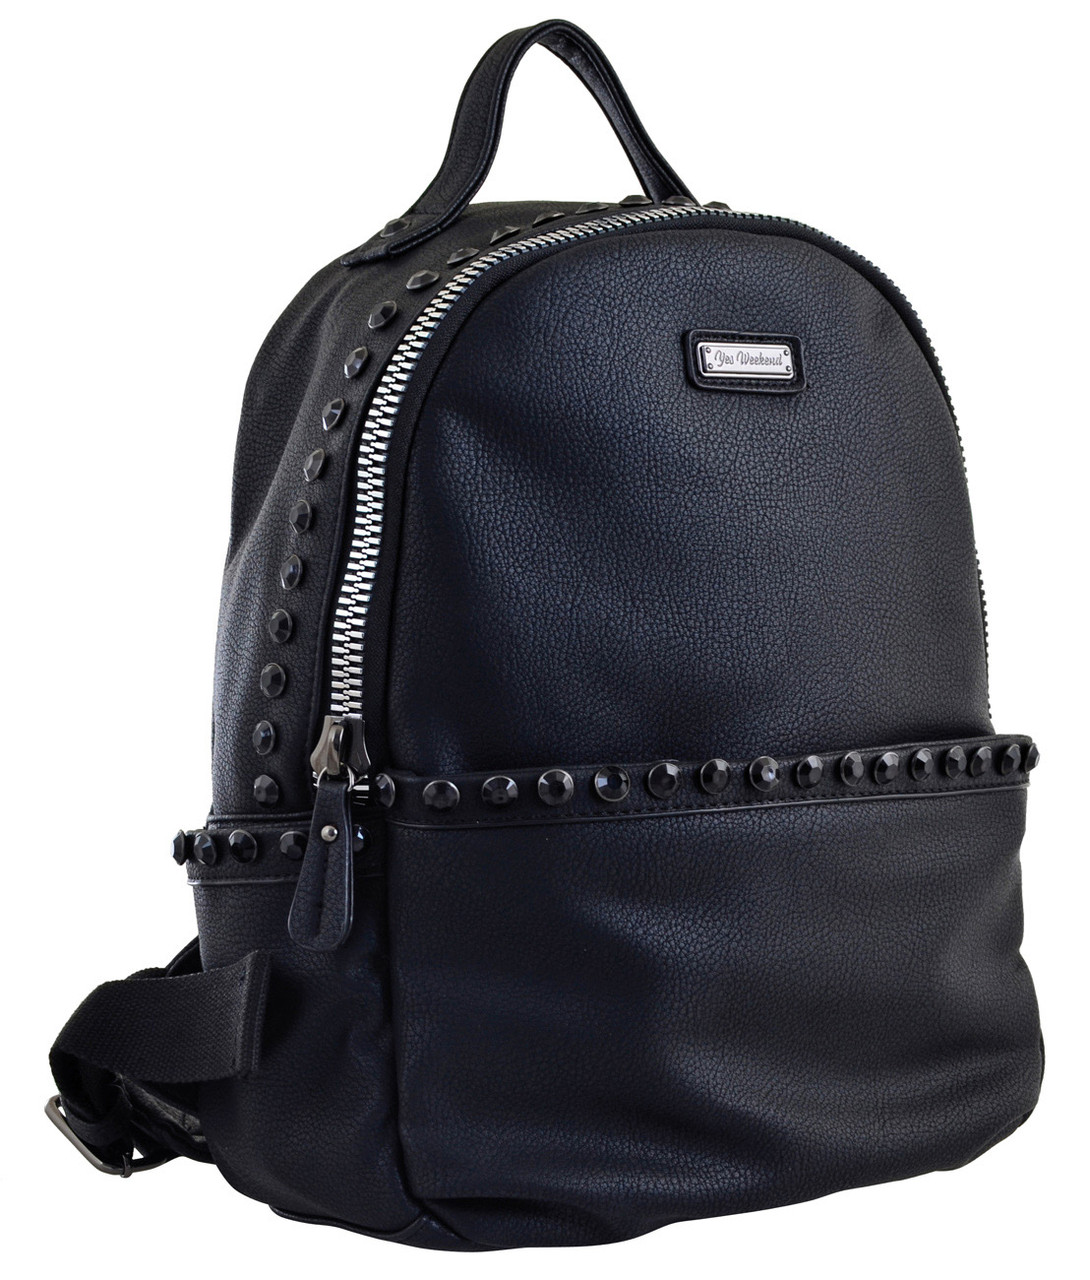 Рюкзак женский YES YW-15 черный код: 556944